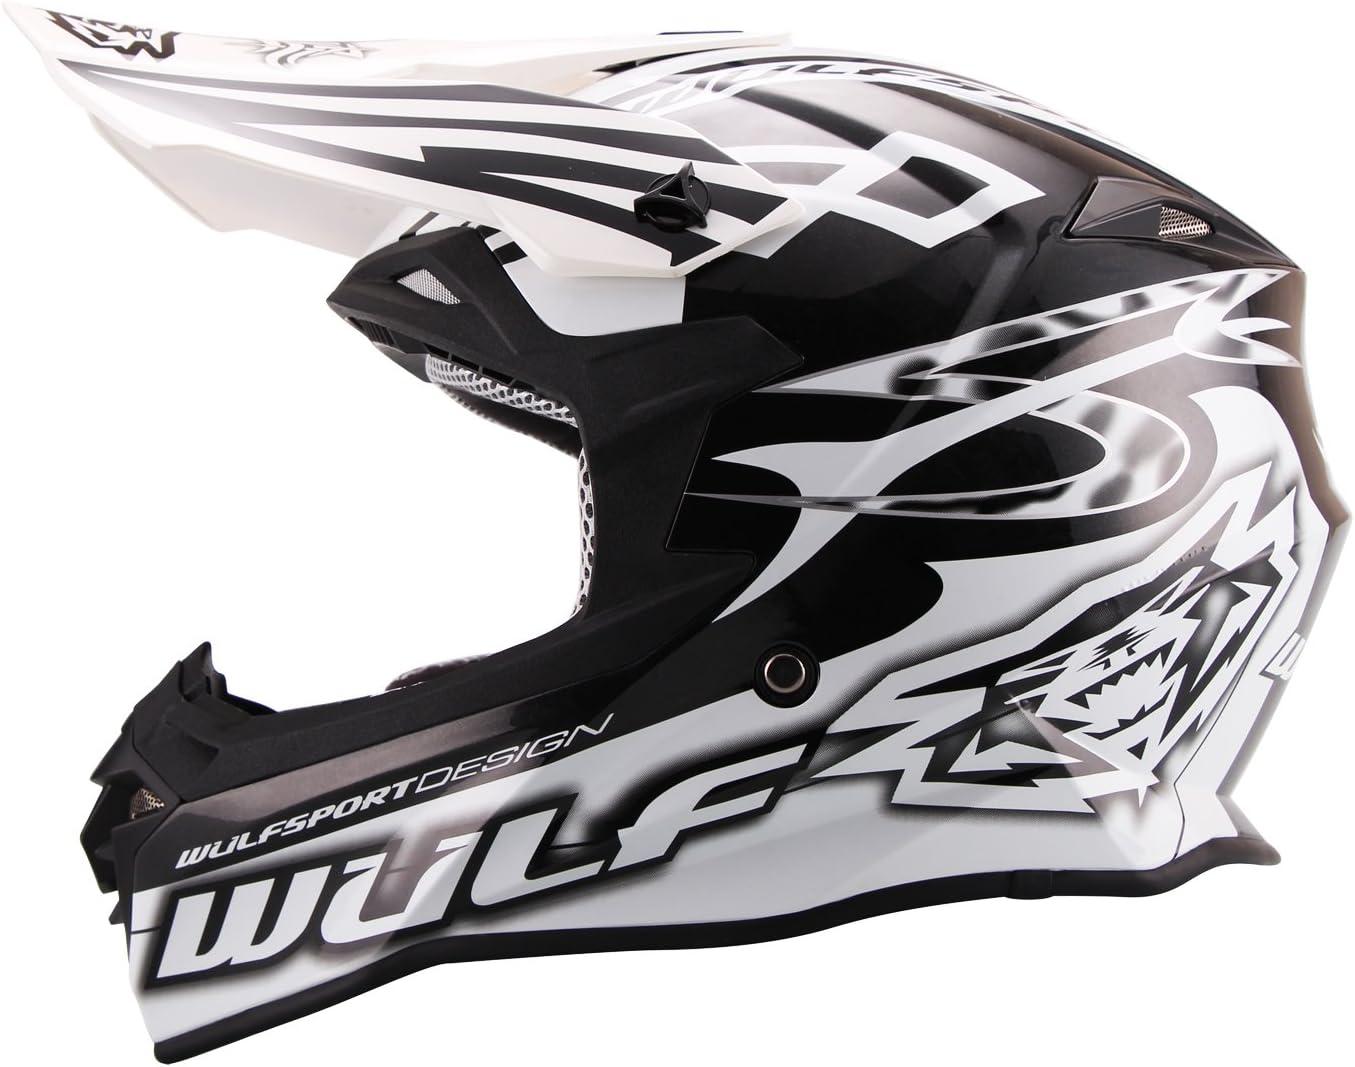 Orange XL Wulfsport Adult Sceptre Motorbike Helmet /& Wulf Adult Motocross Goggles /& Gloves 61-62cm